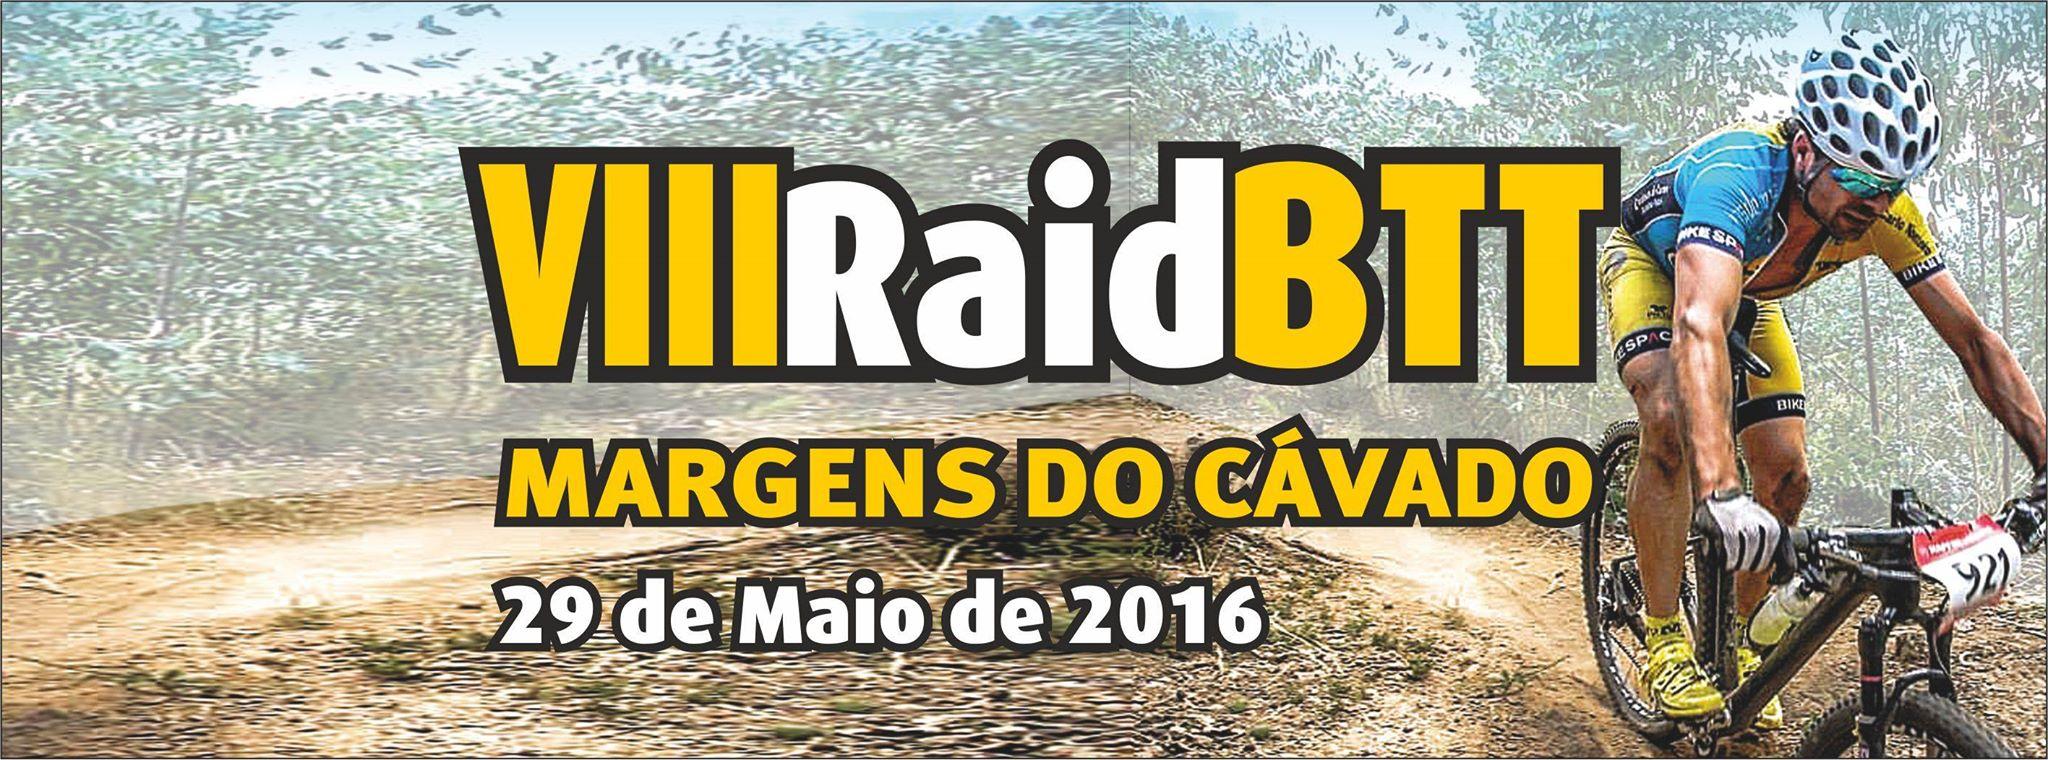 VIII Raid BTT Margens do Cávado 2016